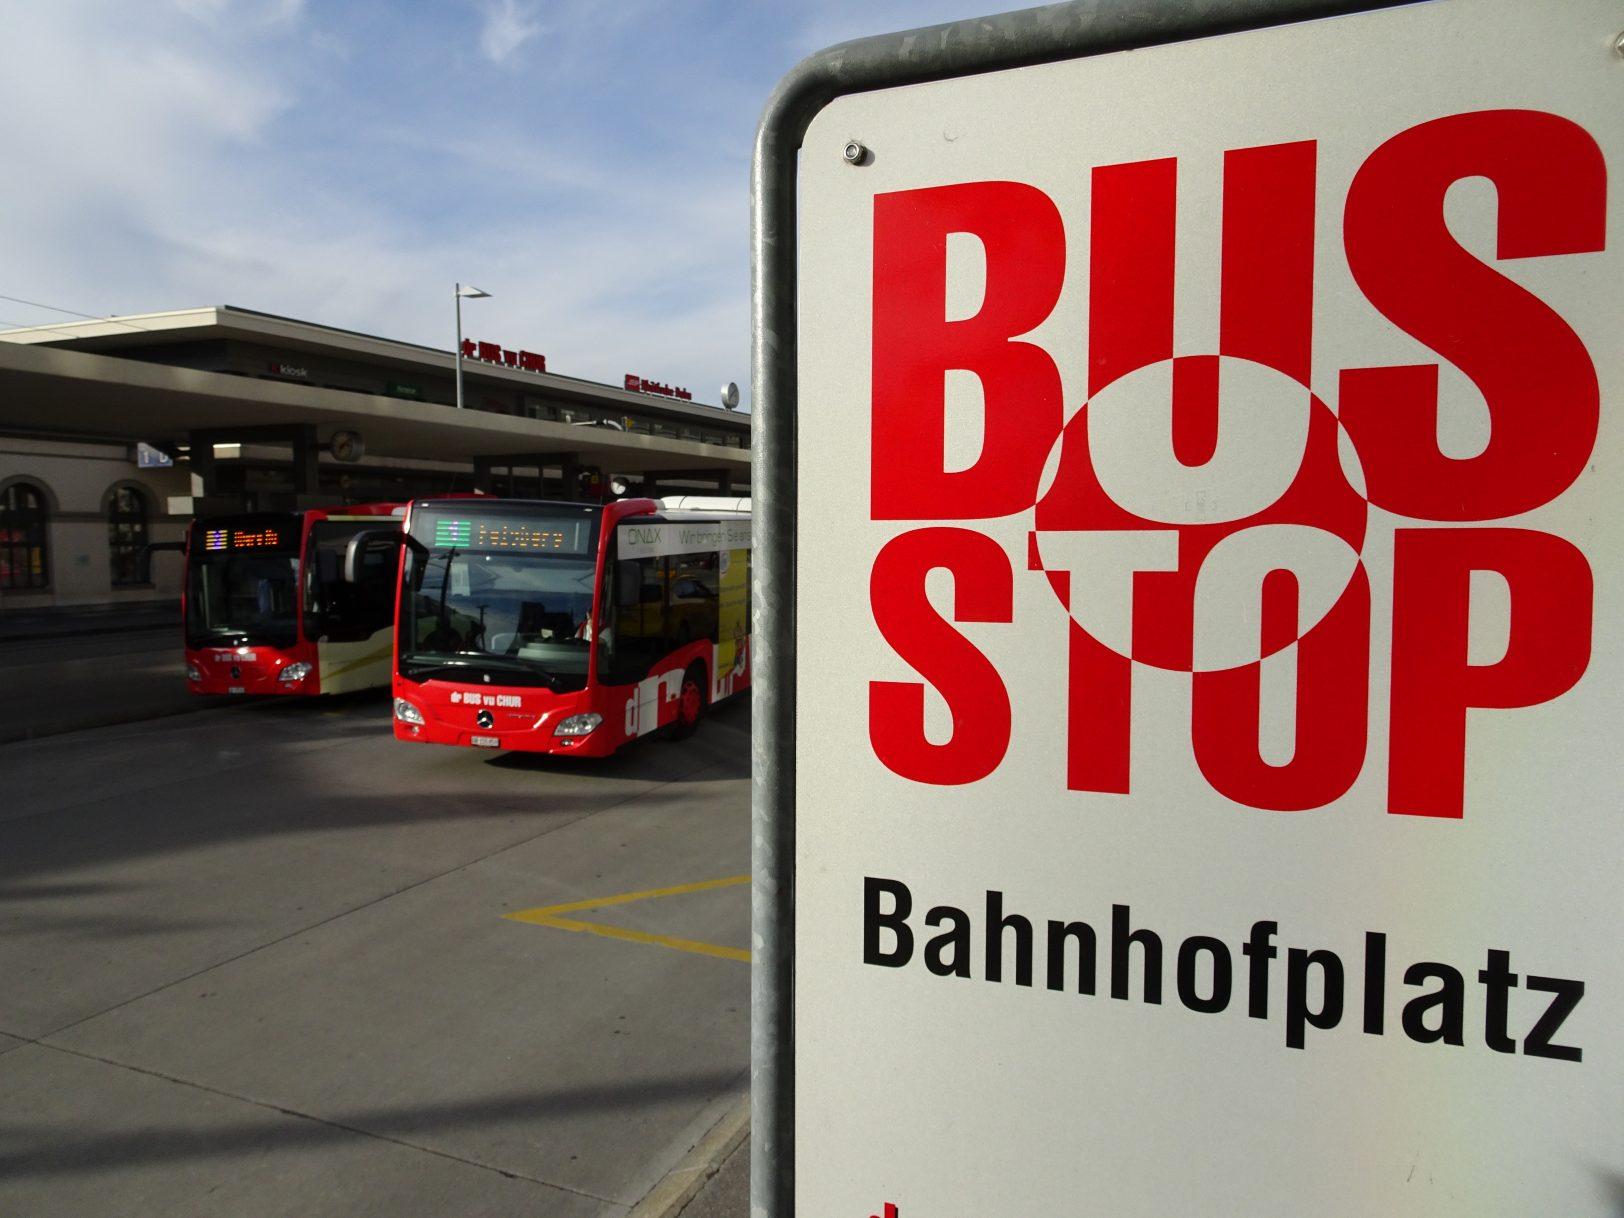 churbus_bahnhofplatz_1200x900